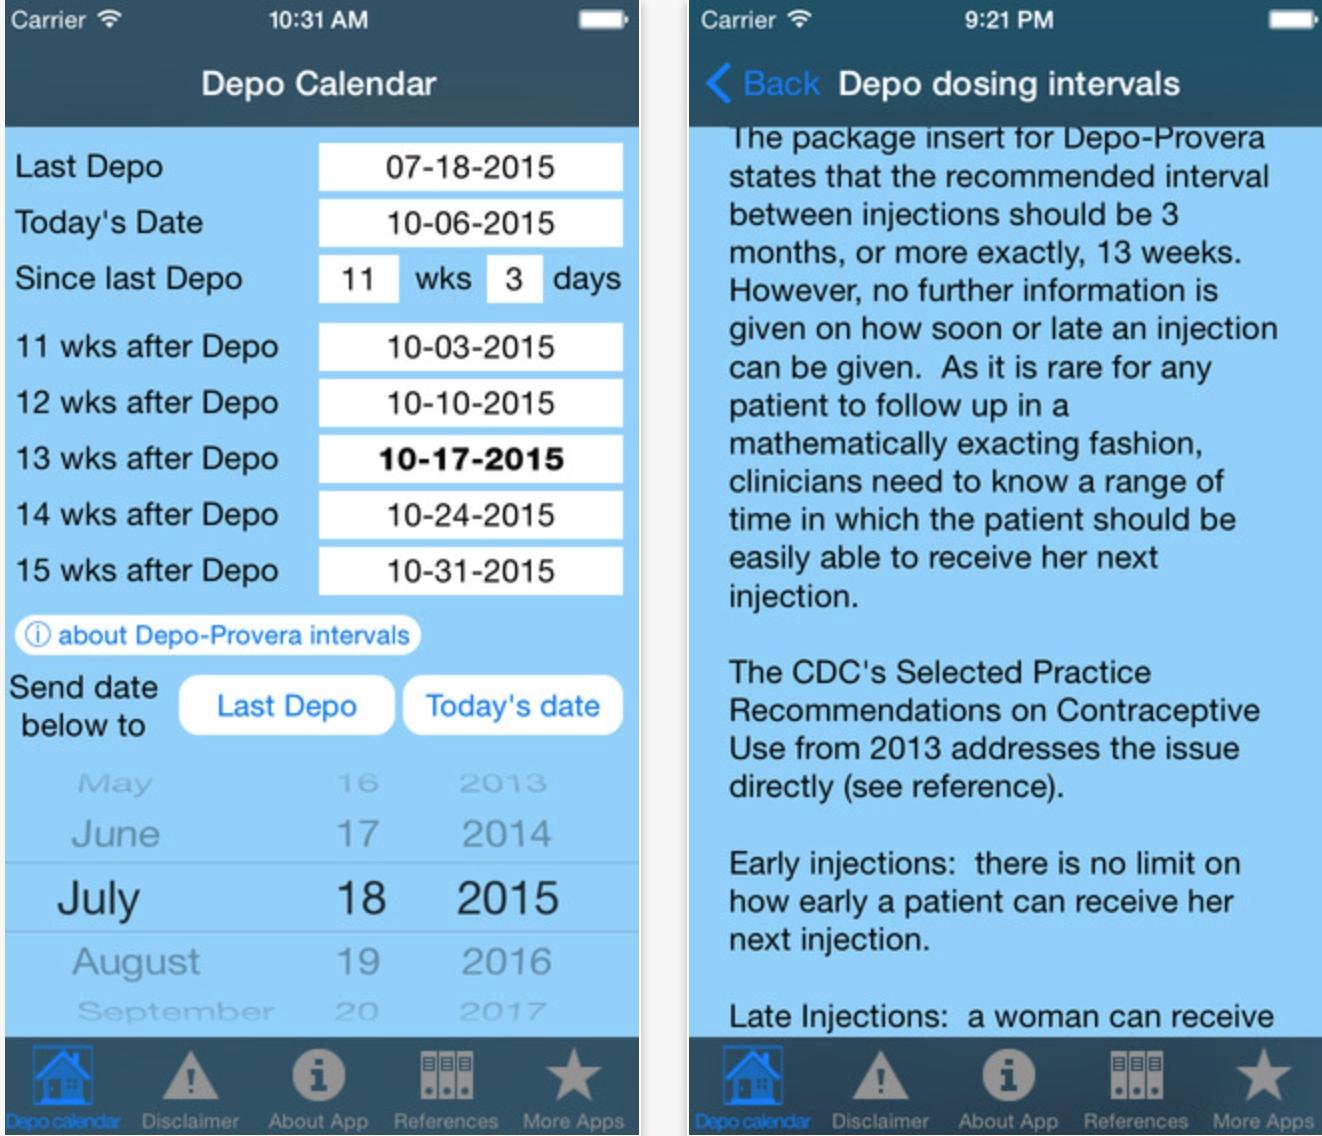 Depo Calendar App Could Significantly Improve Contraception  Depo-Provera Shot Calendar